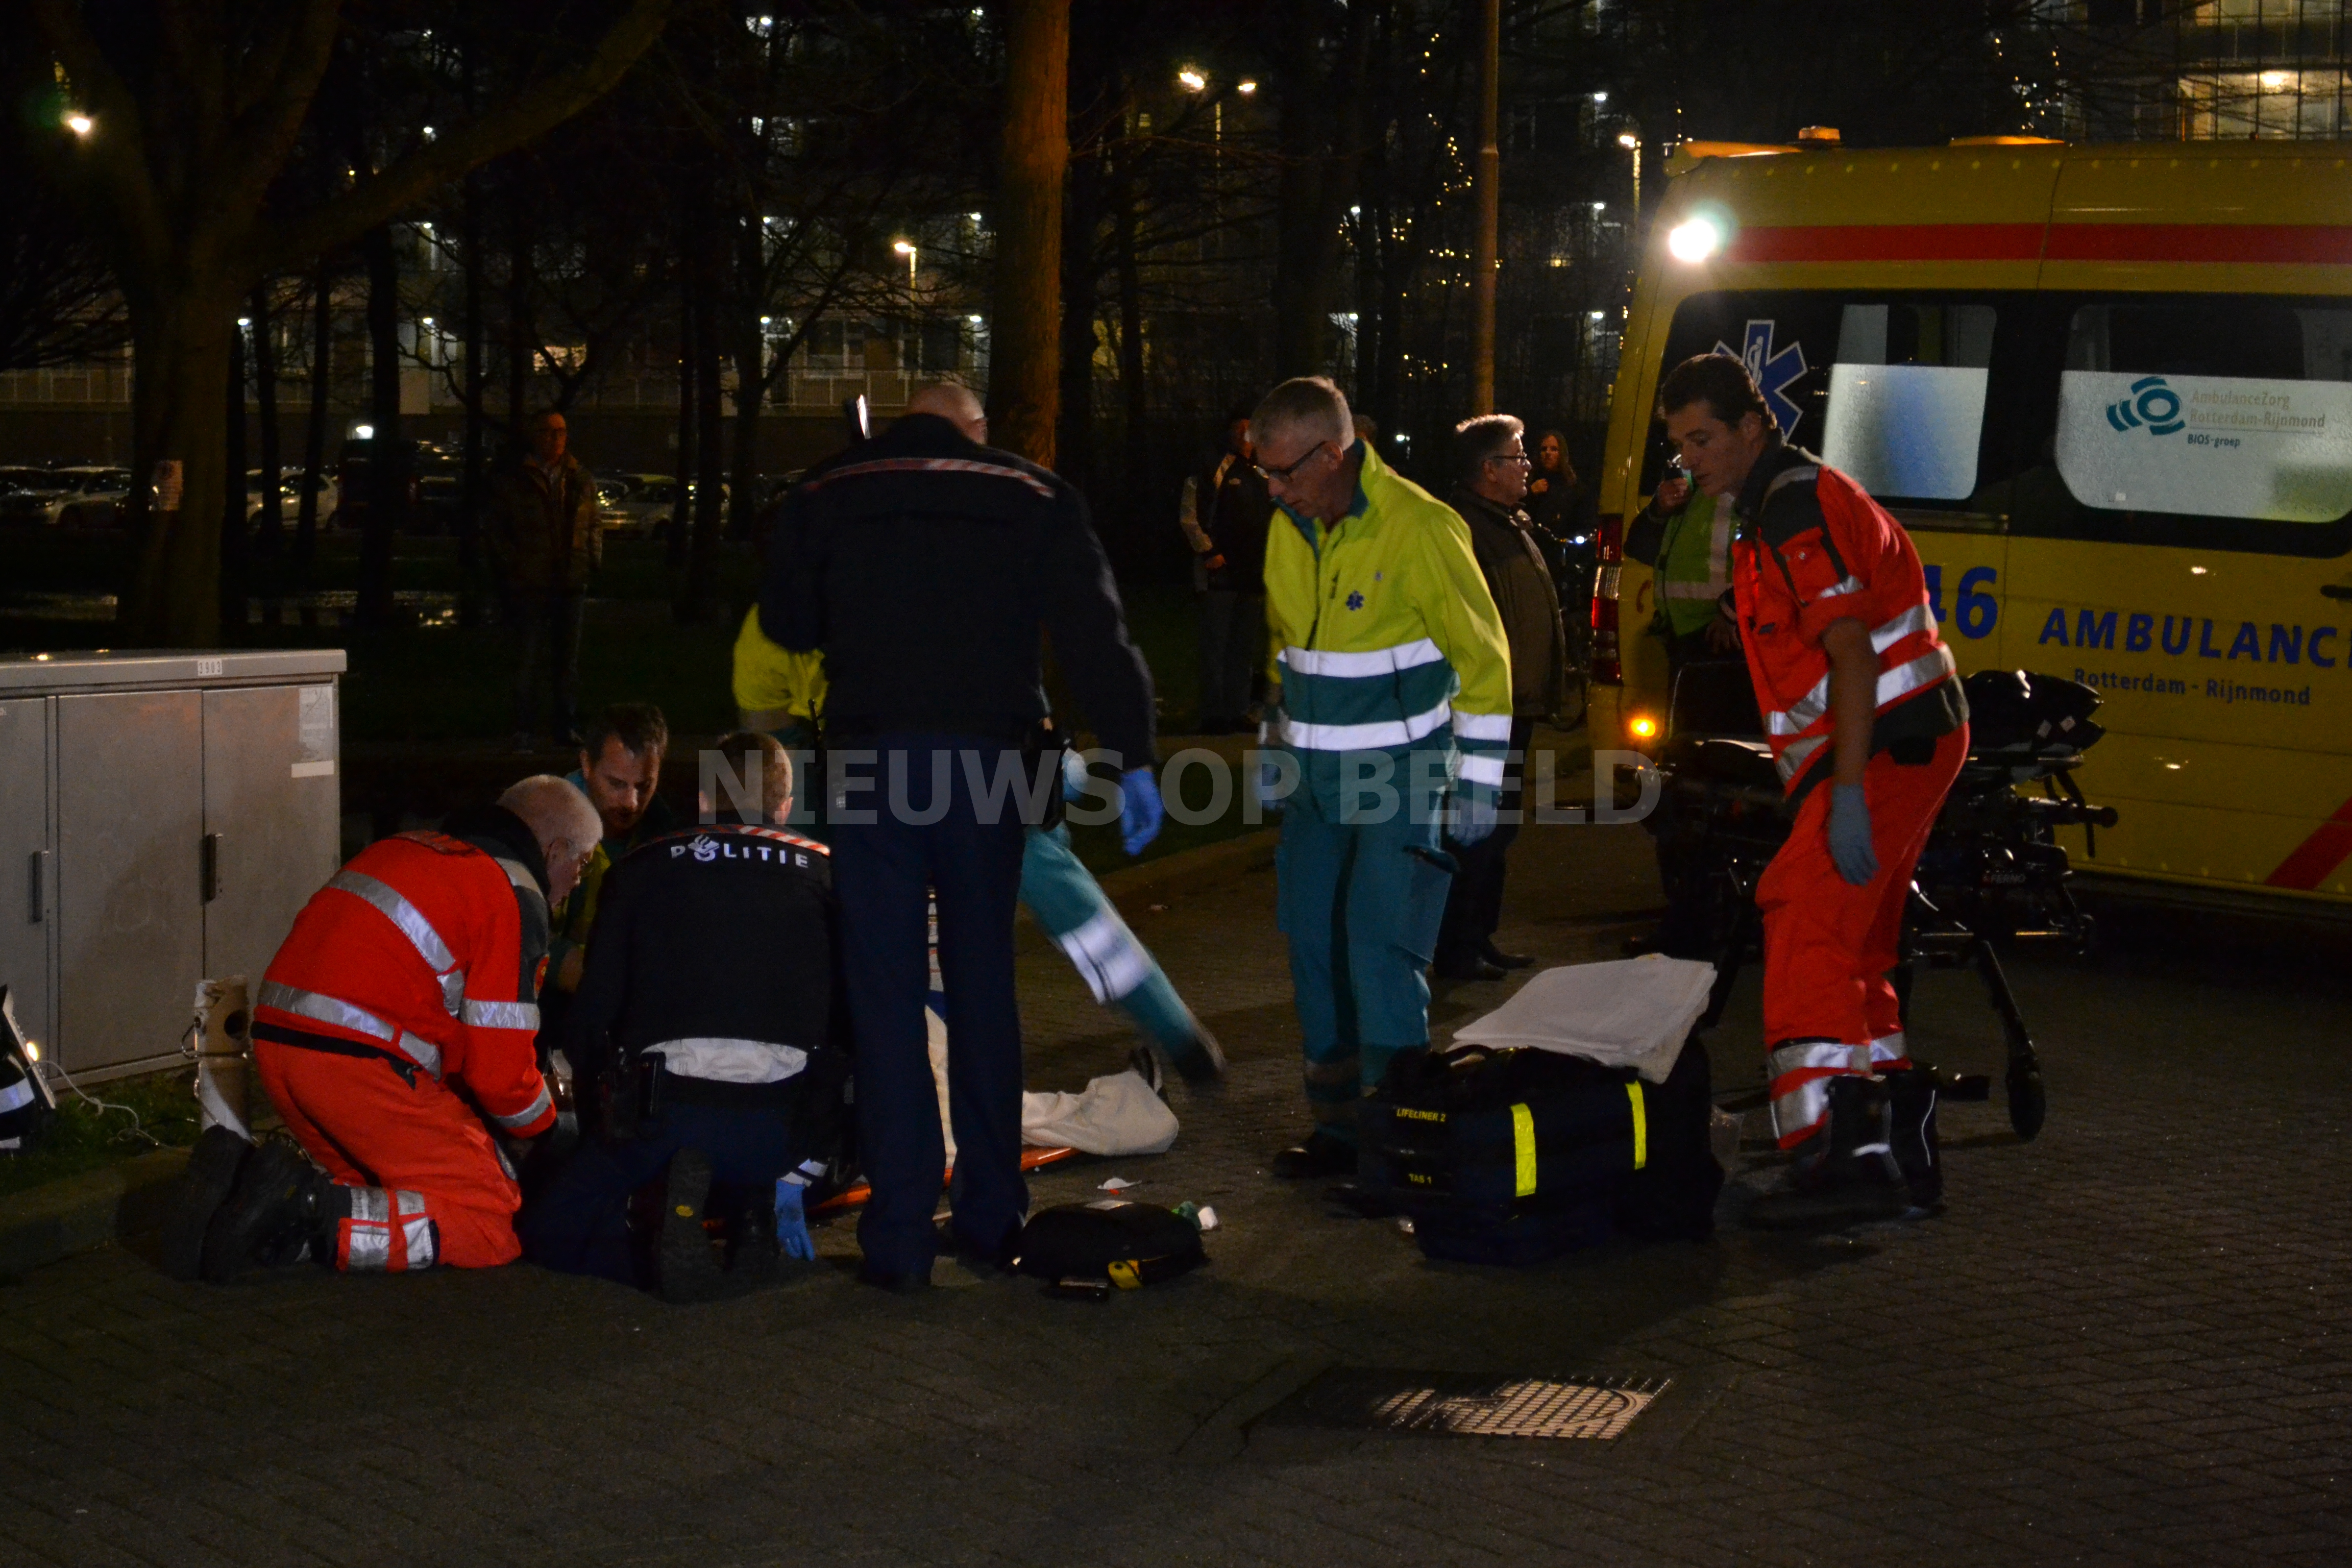 Automobilist laat slachtoffer zwaargewond achter na ongeval Kelloggplaats Rotterdam (video)